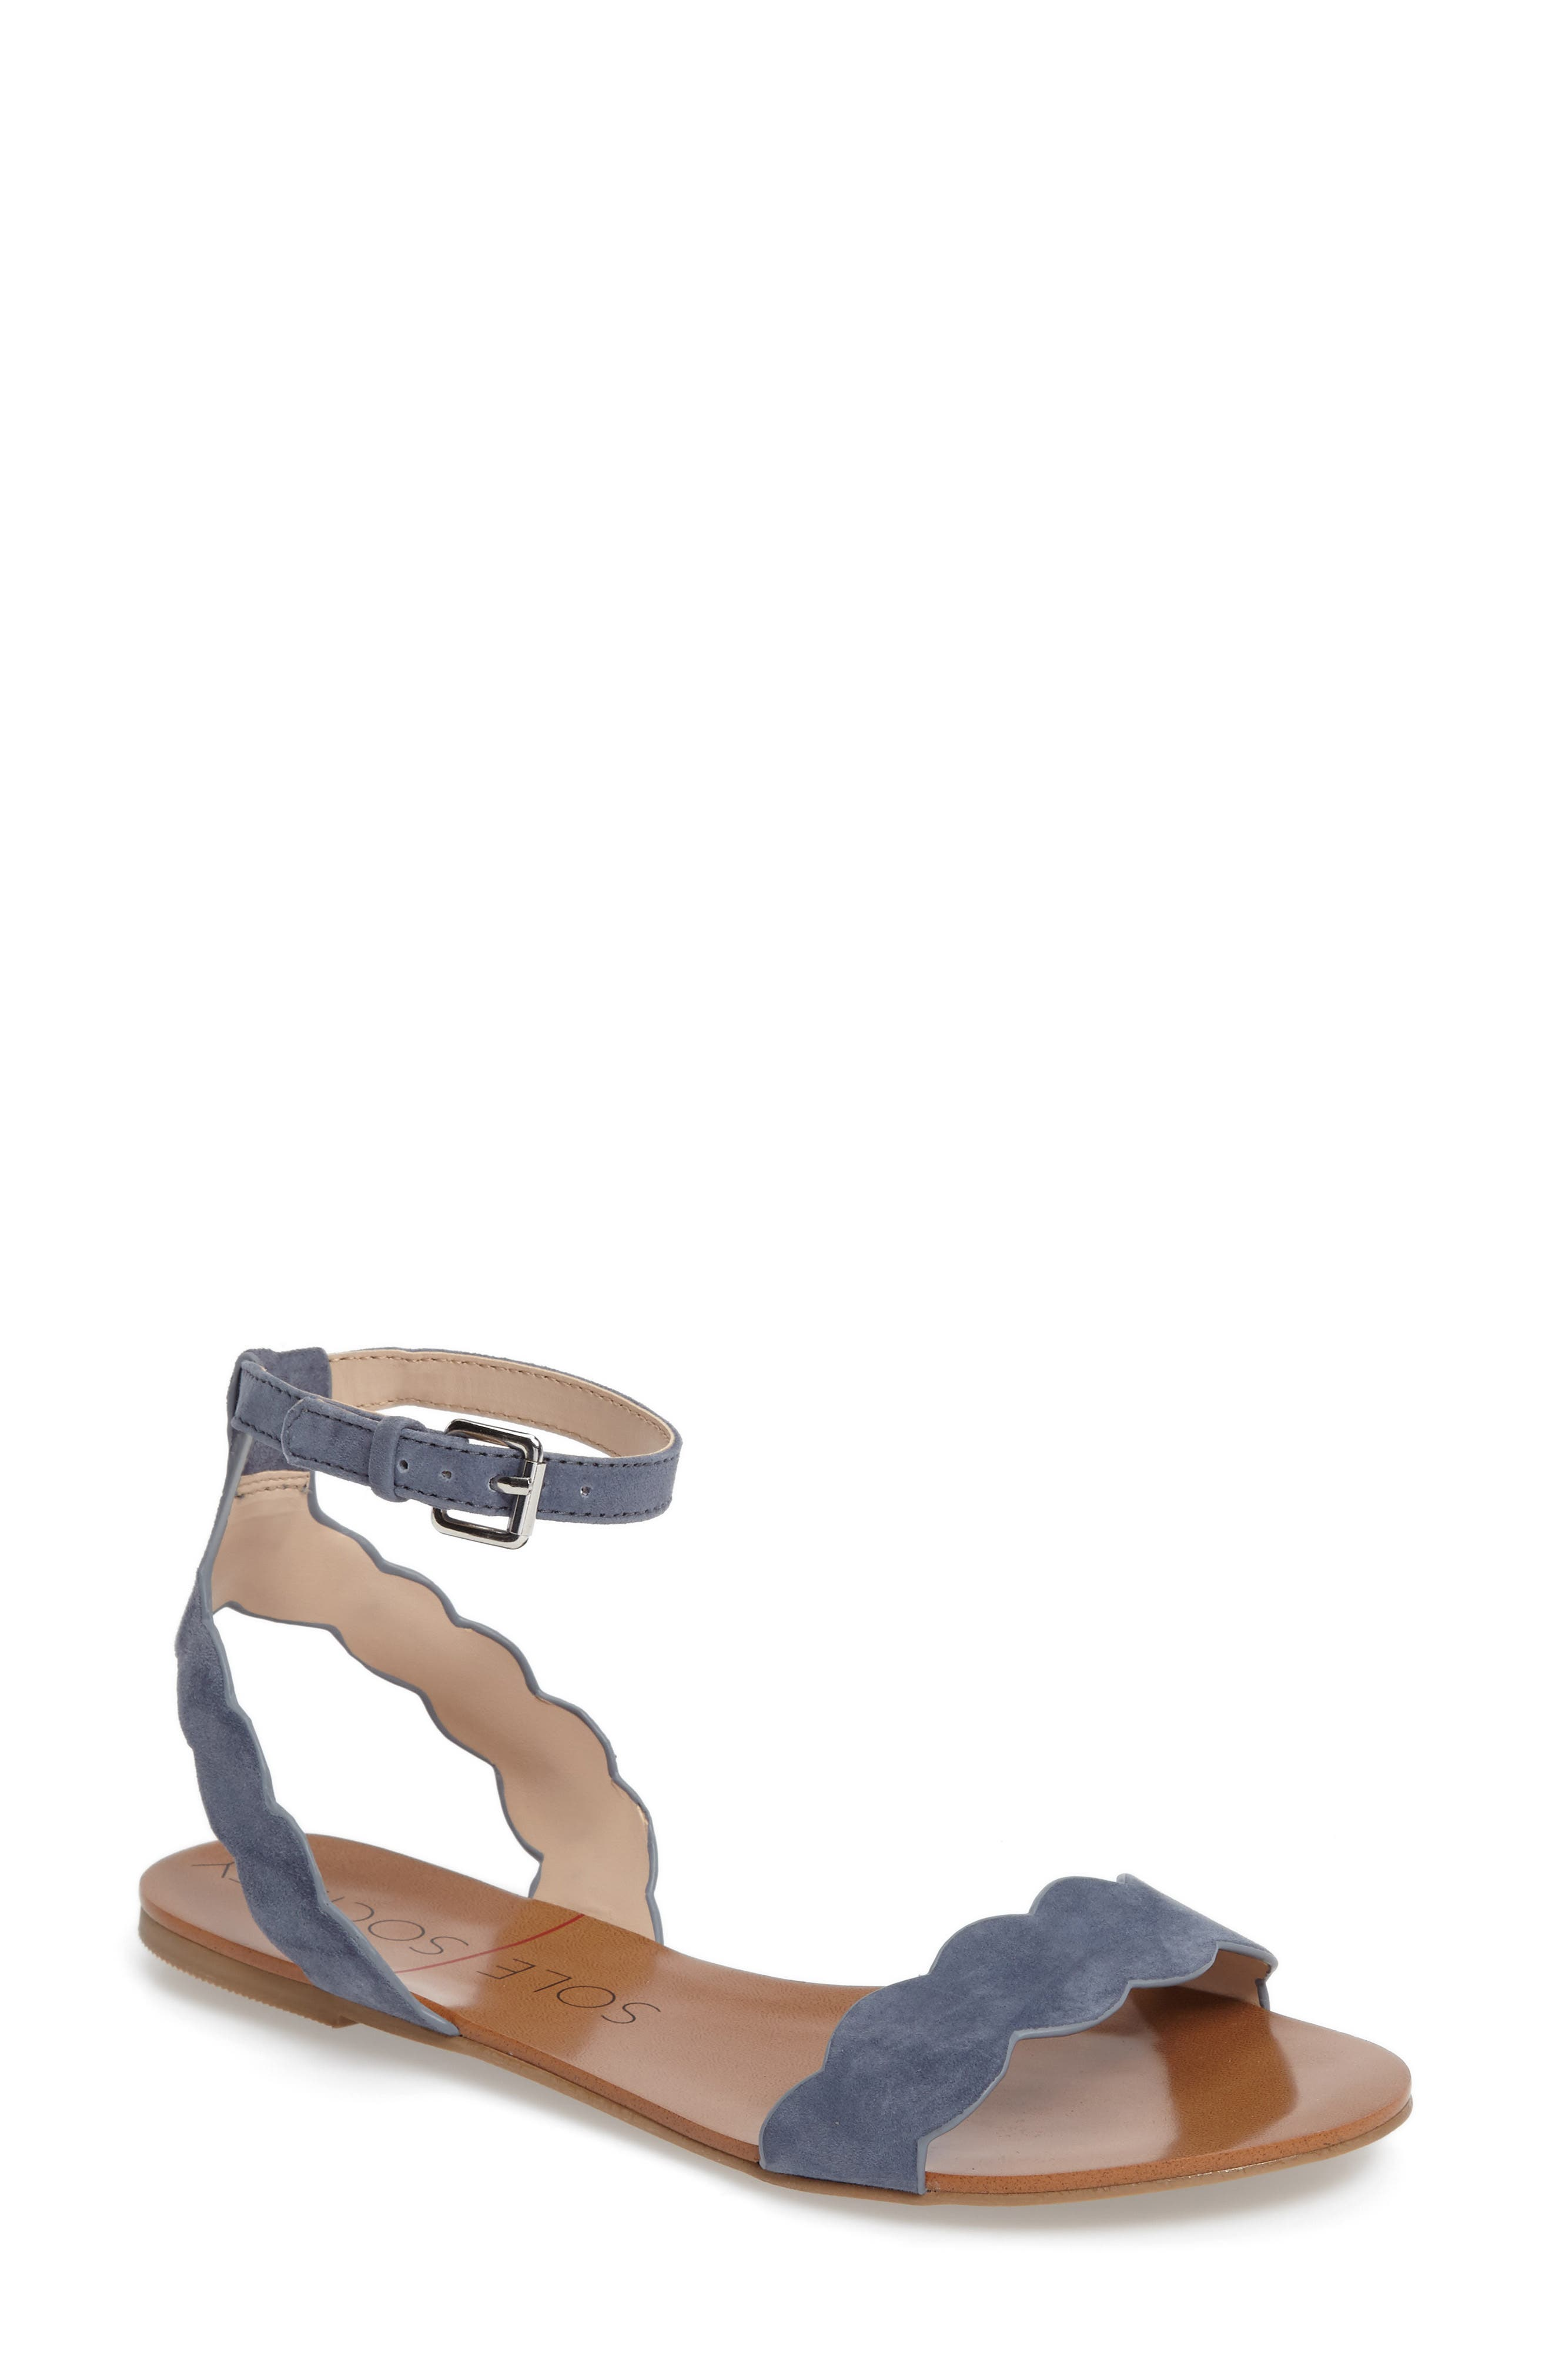 'Odette' Scalloped Ankle Strap Flat Sandal,                             Main thumbnail 6, color,